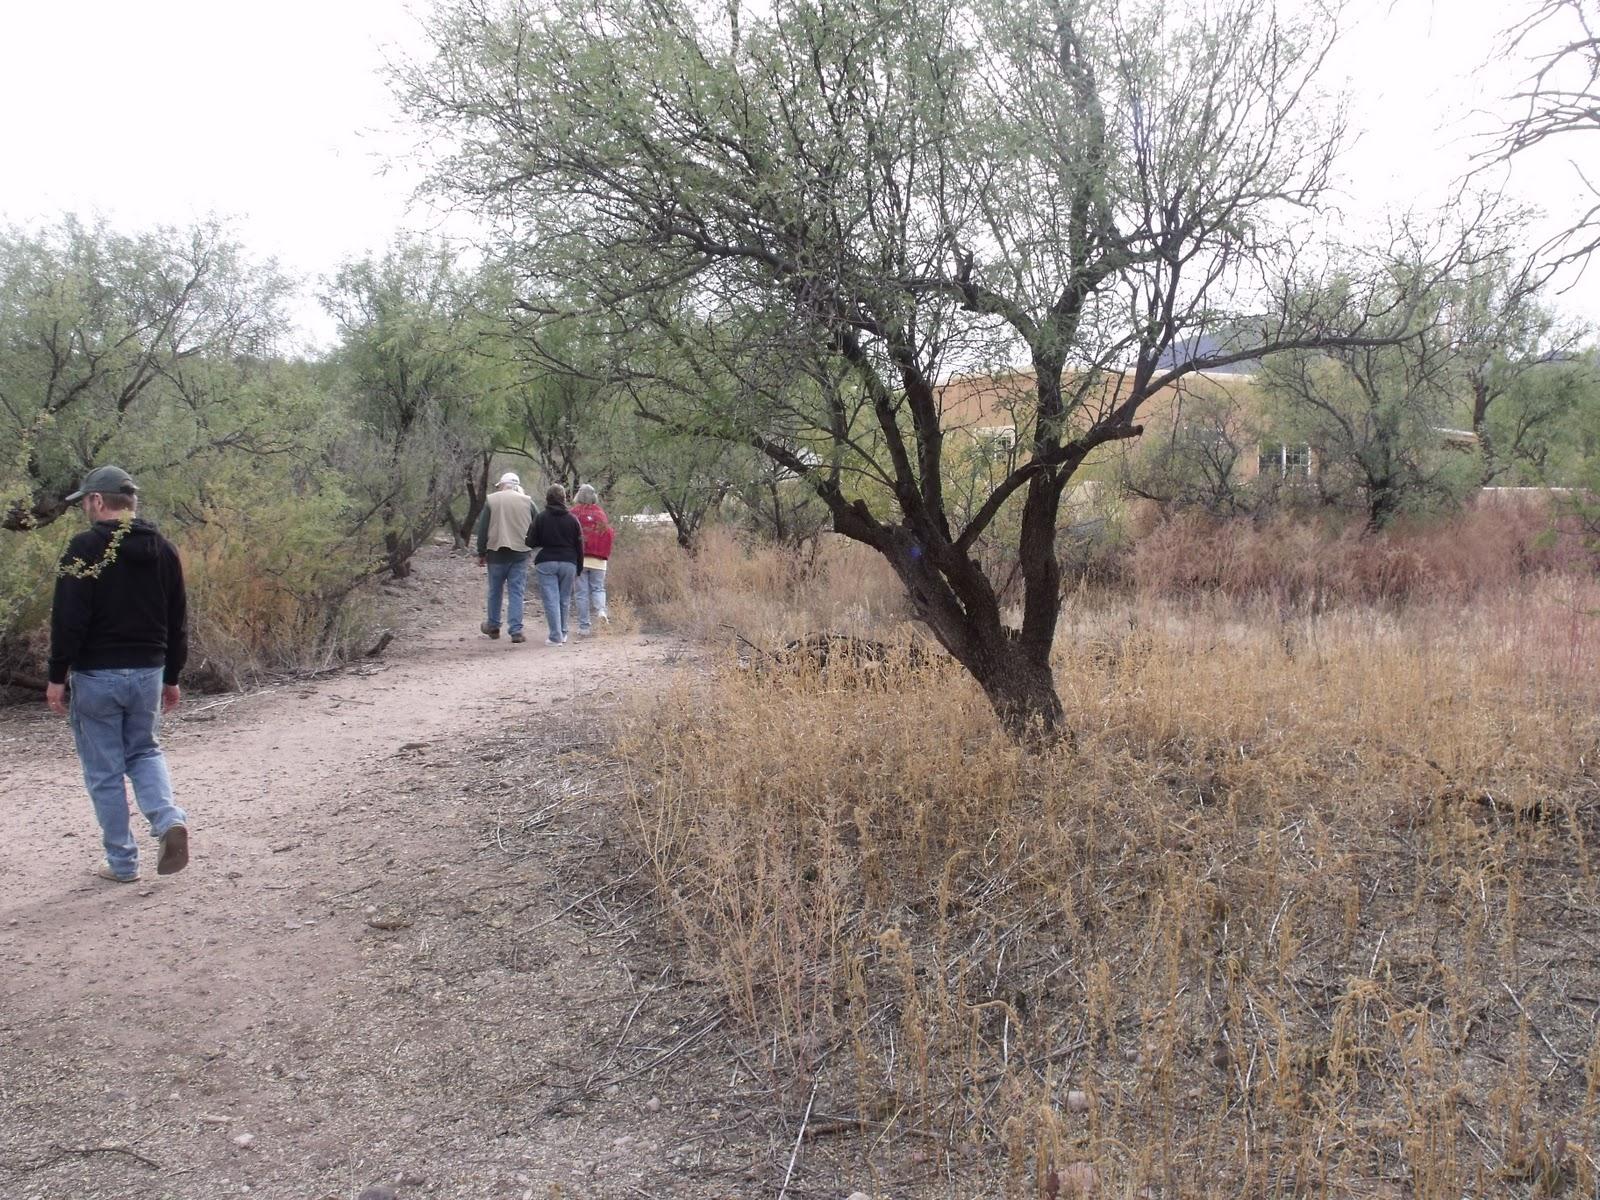 cathy u0027s crazy by design visiting arizona and the dam bridge